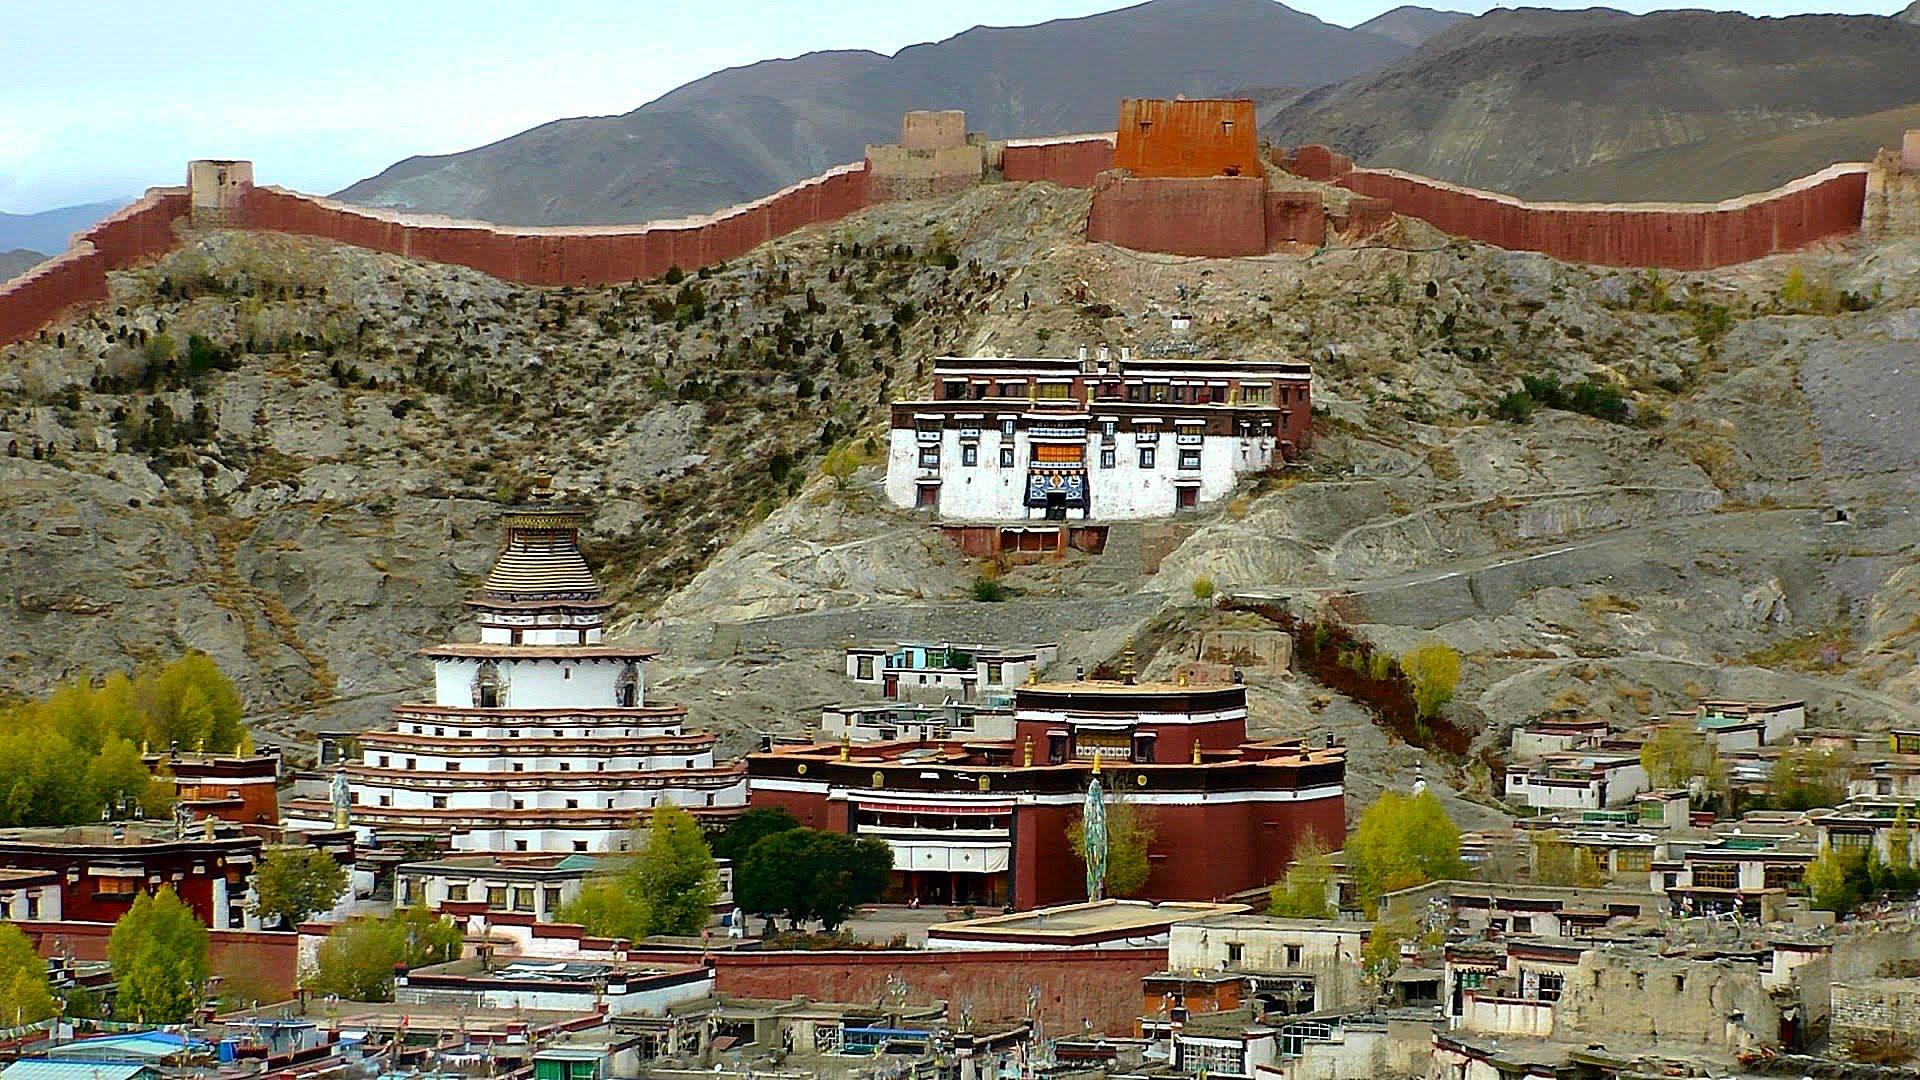 Tibet, Gyantse, Pelkhor Chode Temple